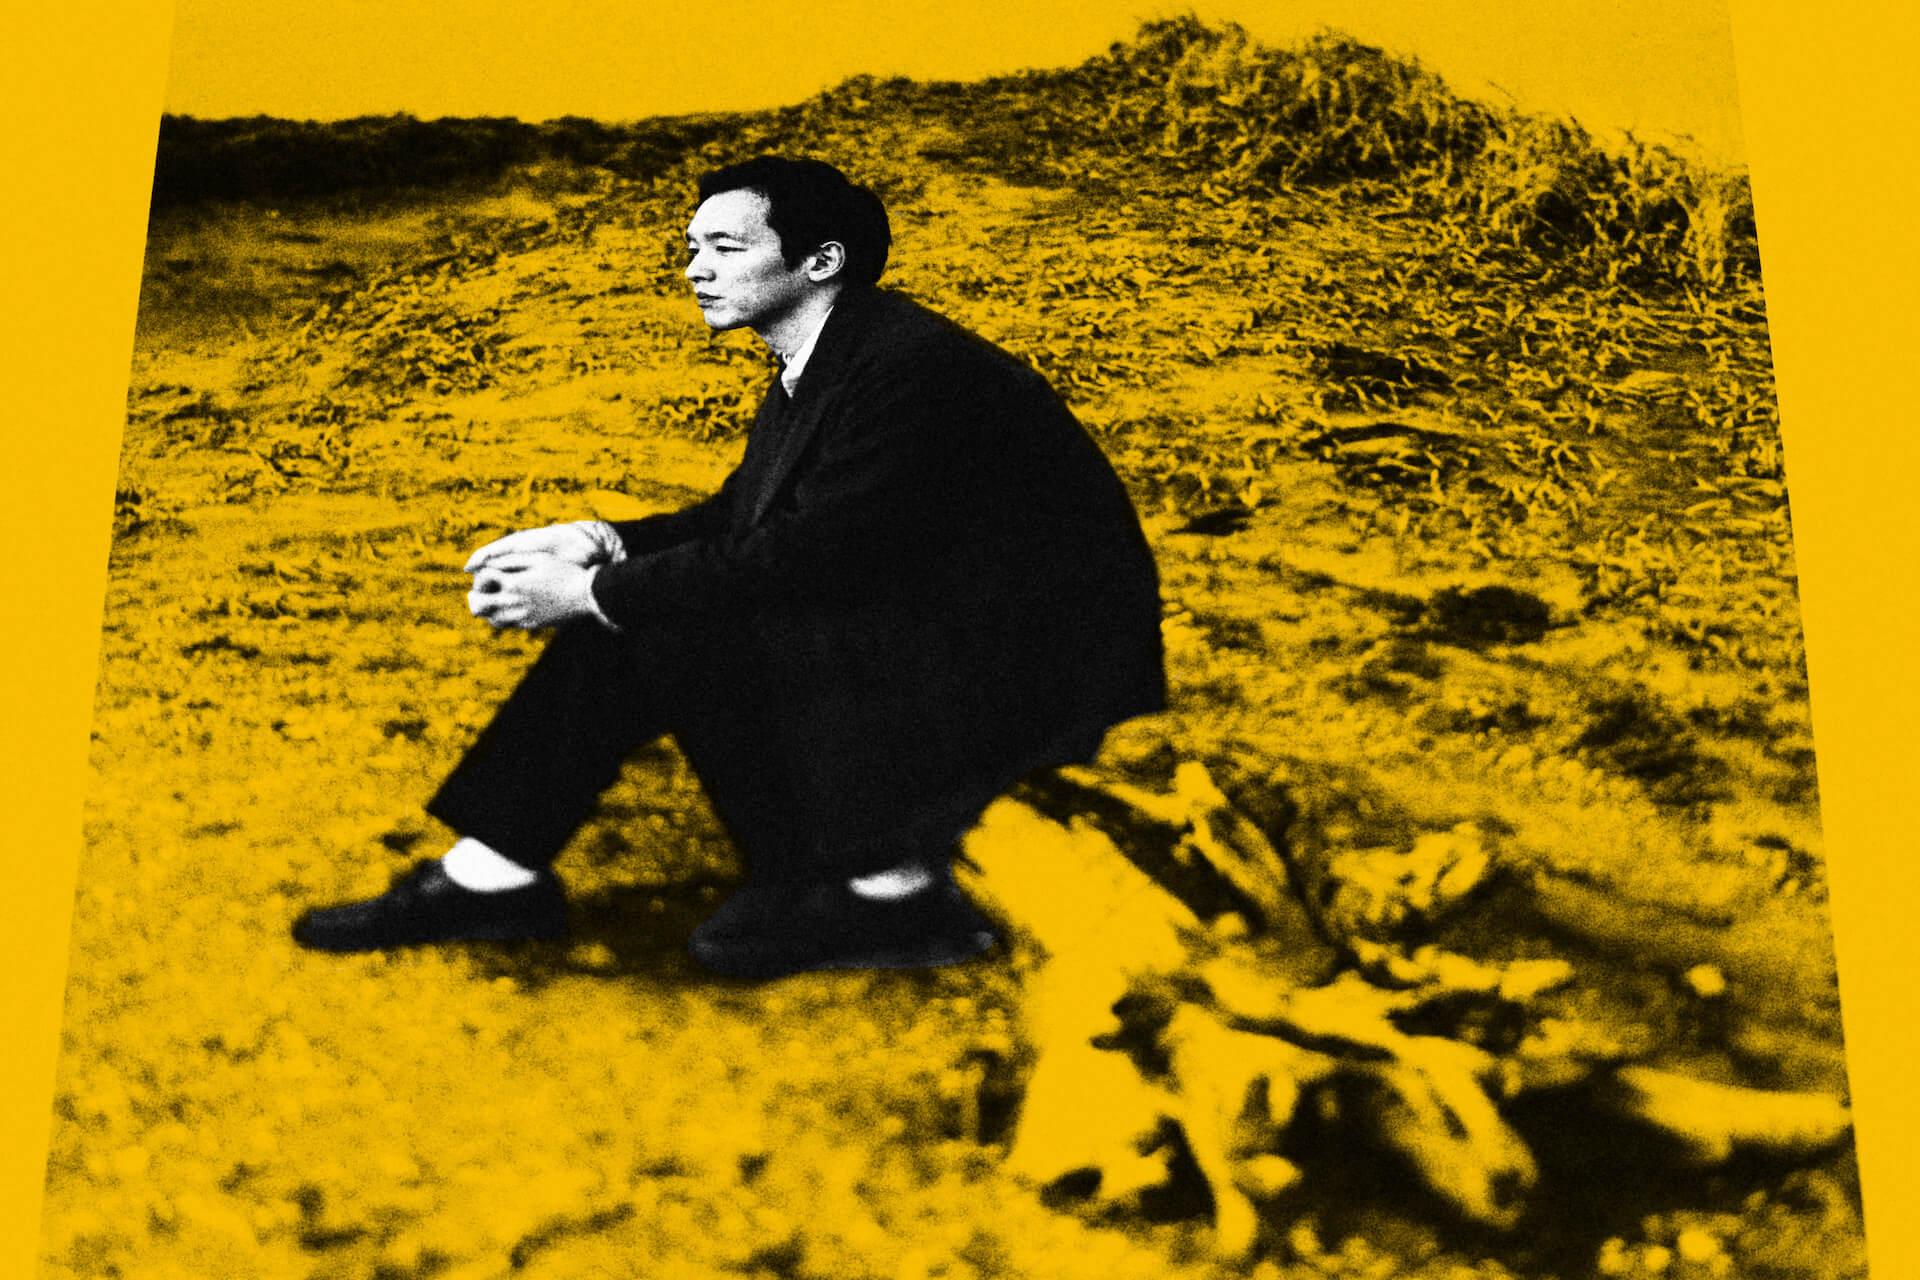 cero髙城晶平によるソロプロジェクトShohei Takagi Parallela Botanicaの1stアルバム『Triptych』リリース決定!角銅真実が帯同するツアーも music200218_cero_takagi_1-1